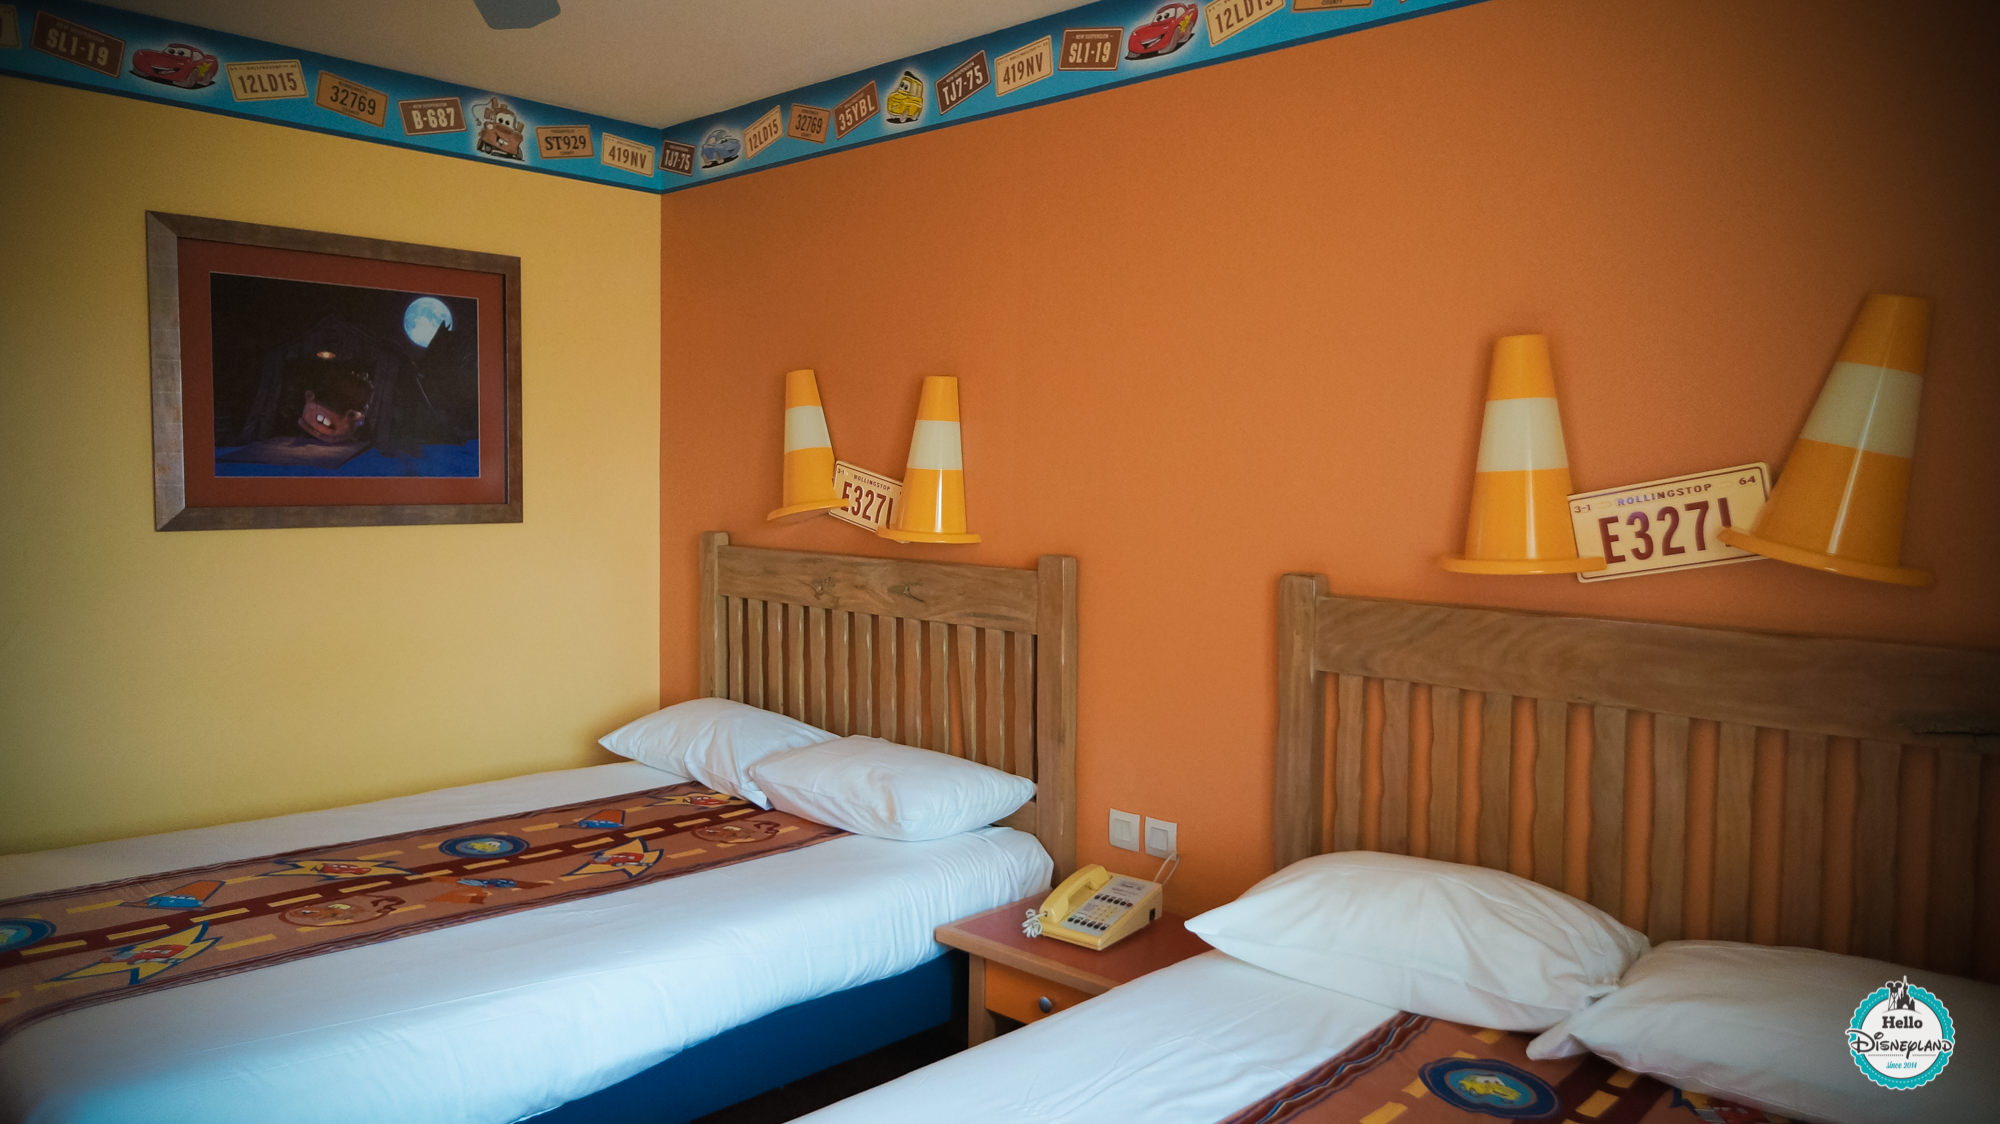 Disney S Hotel Santa Fe Hello Disneyland